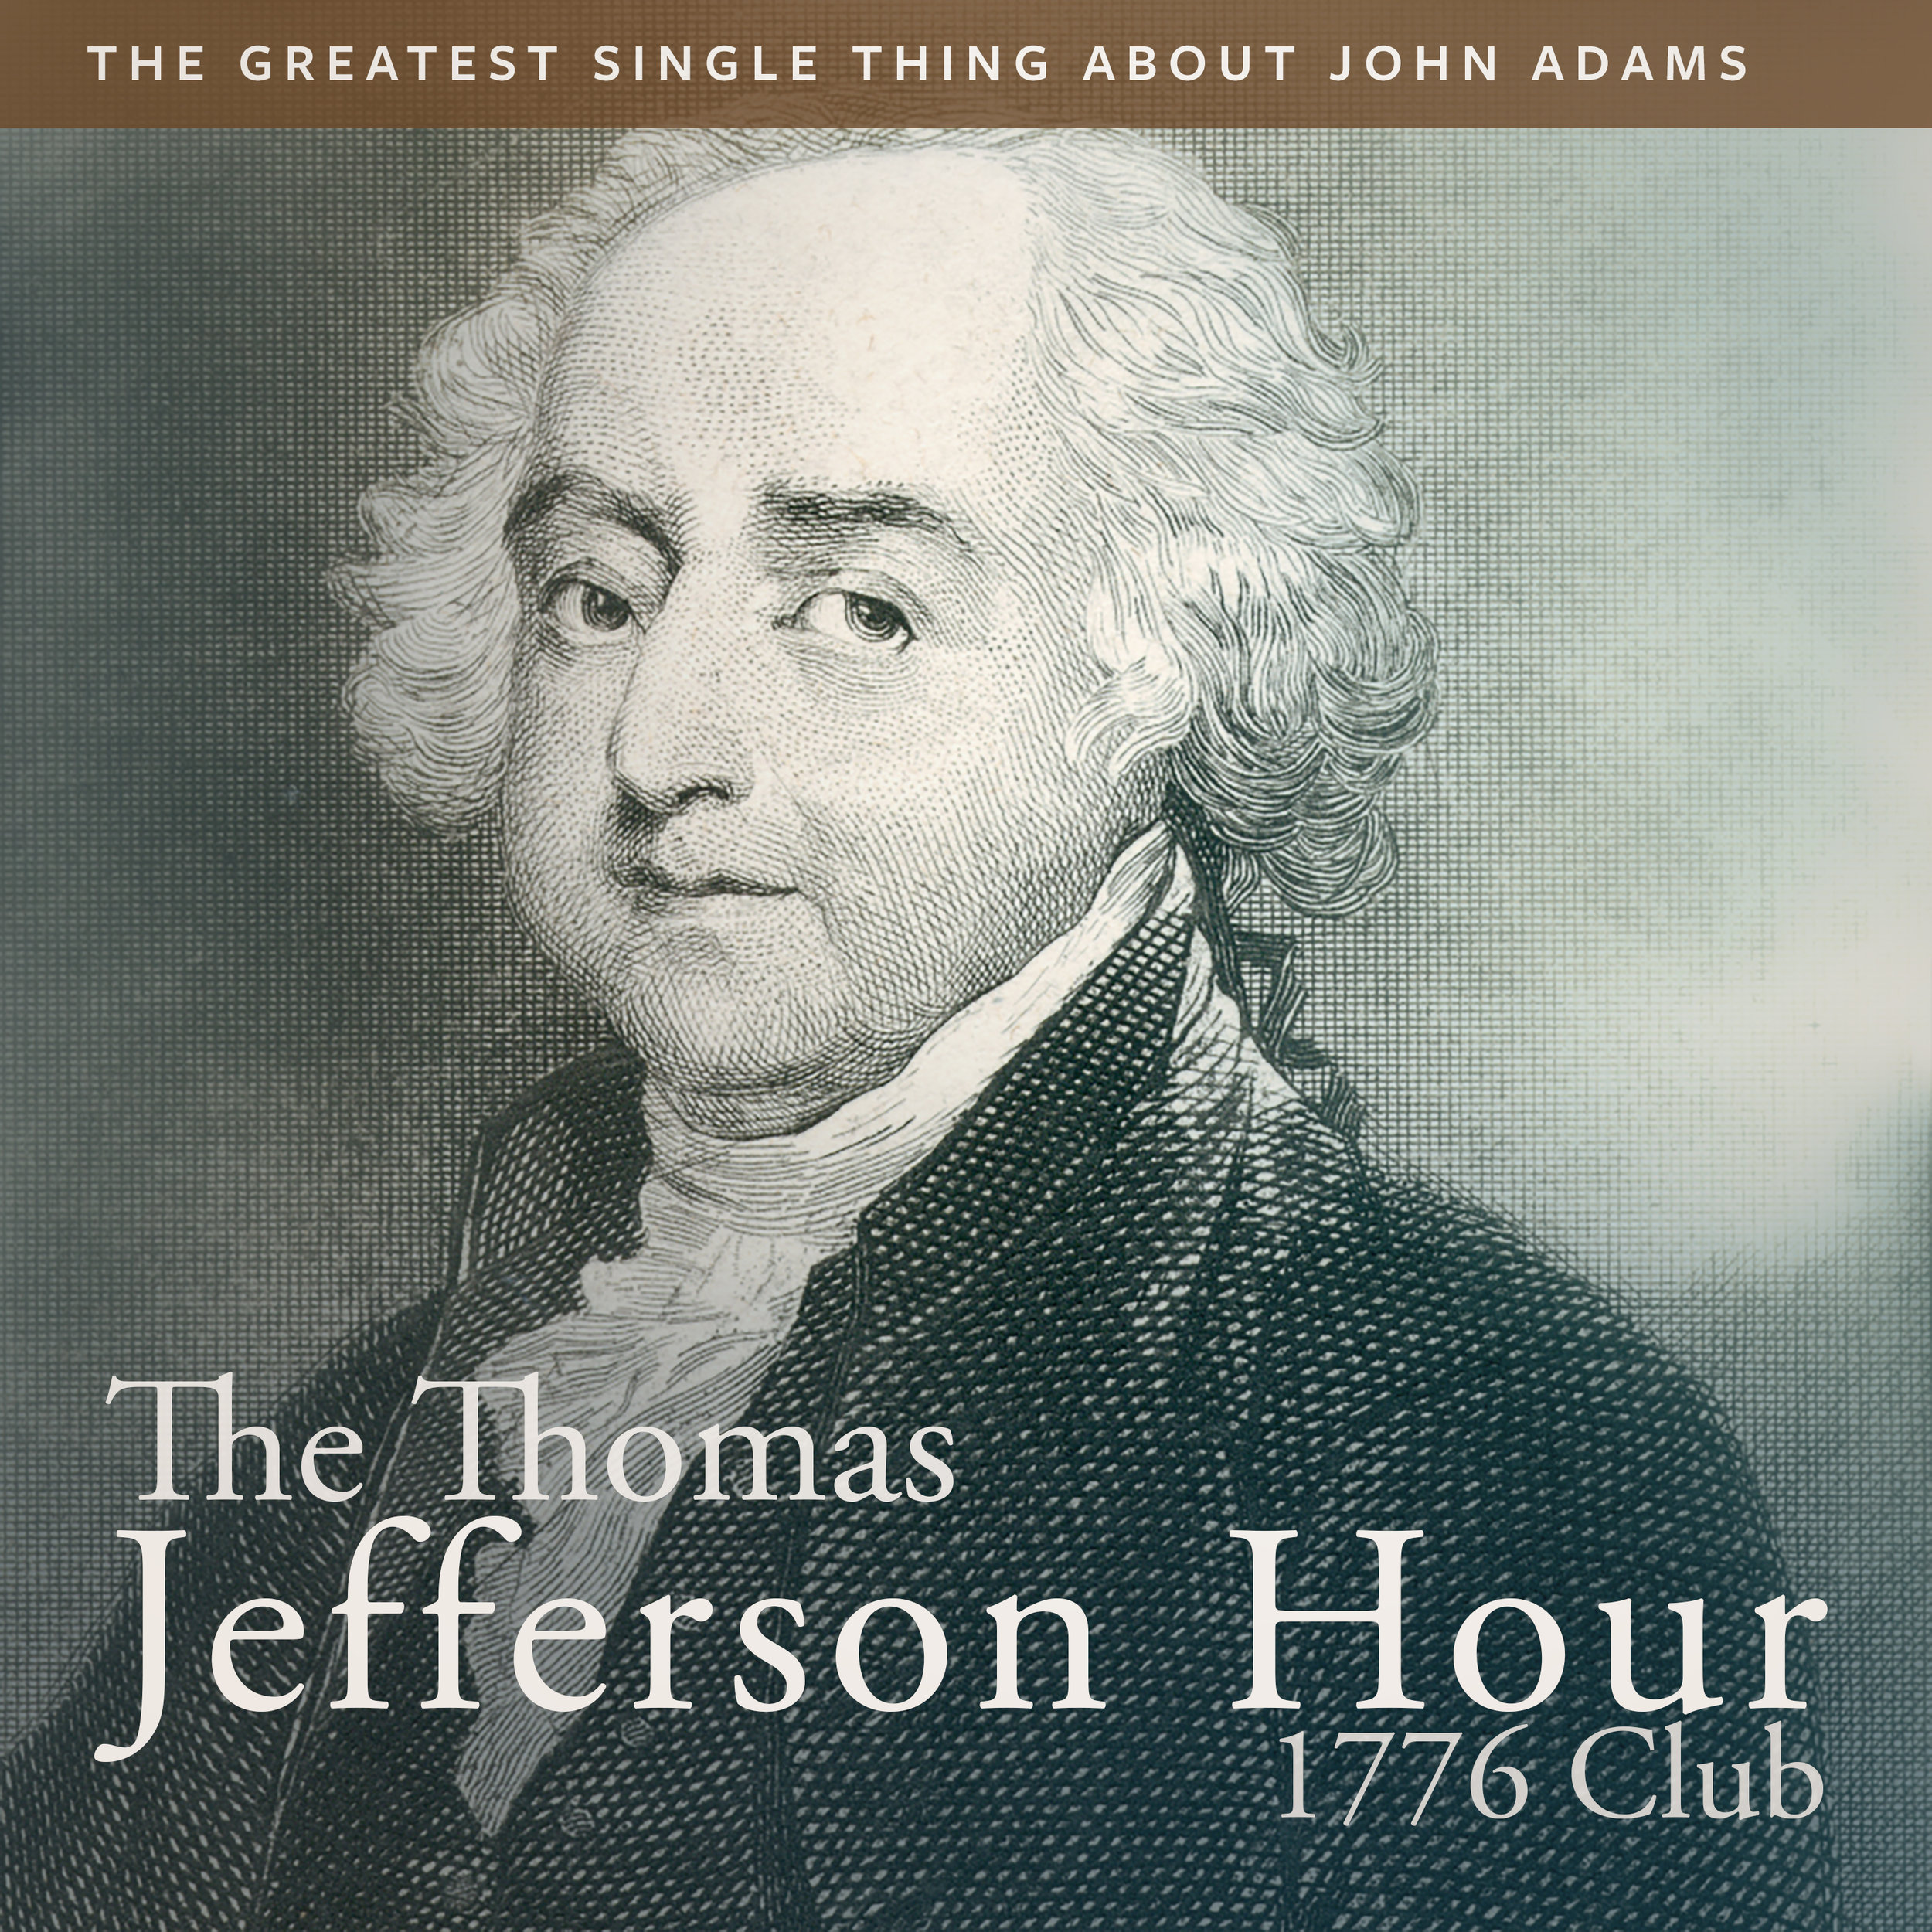 029 The Greatest Single Thing About John Adams.jpg